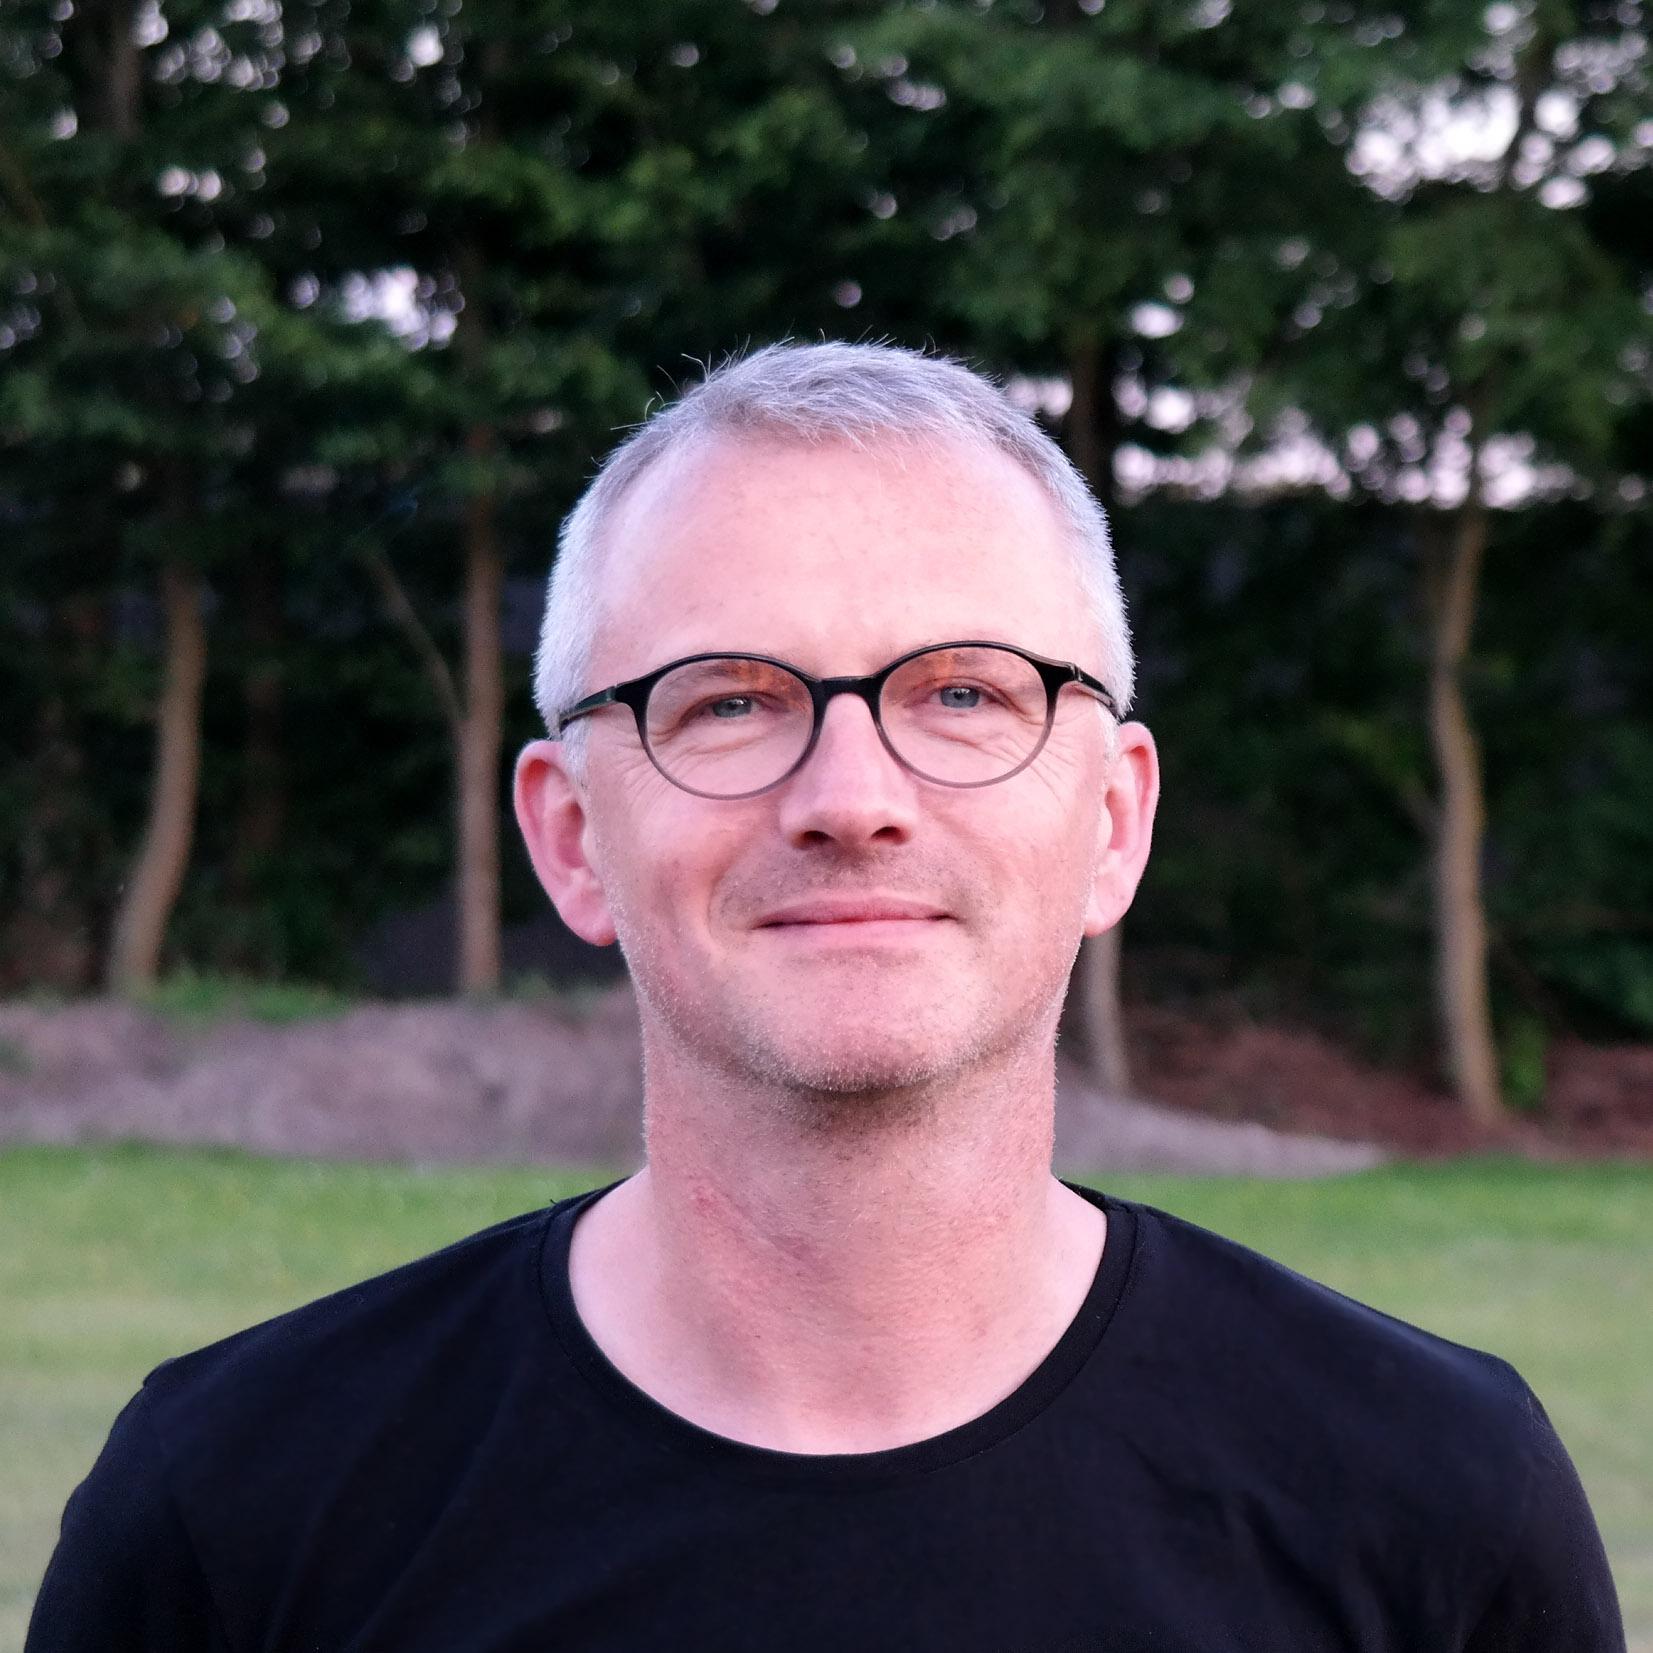 Willem Noorlander